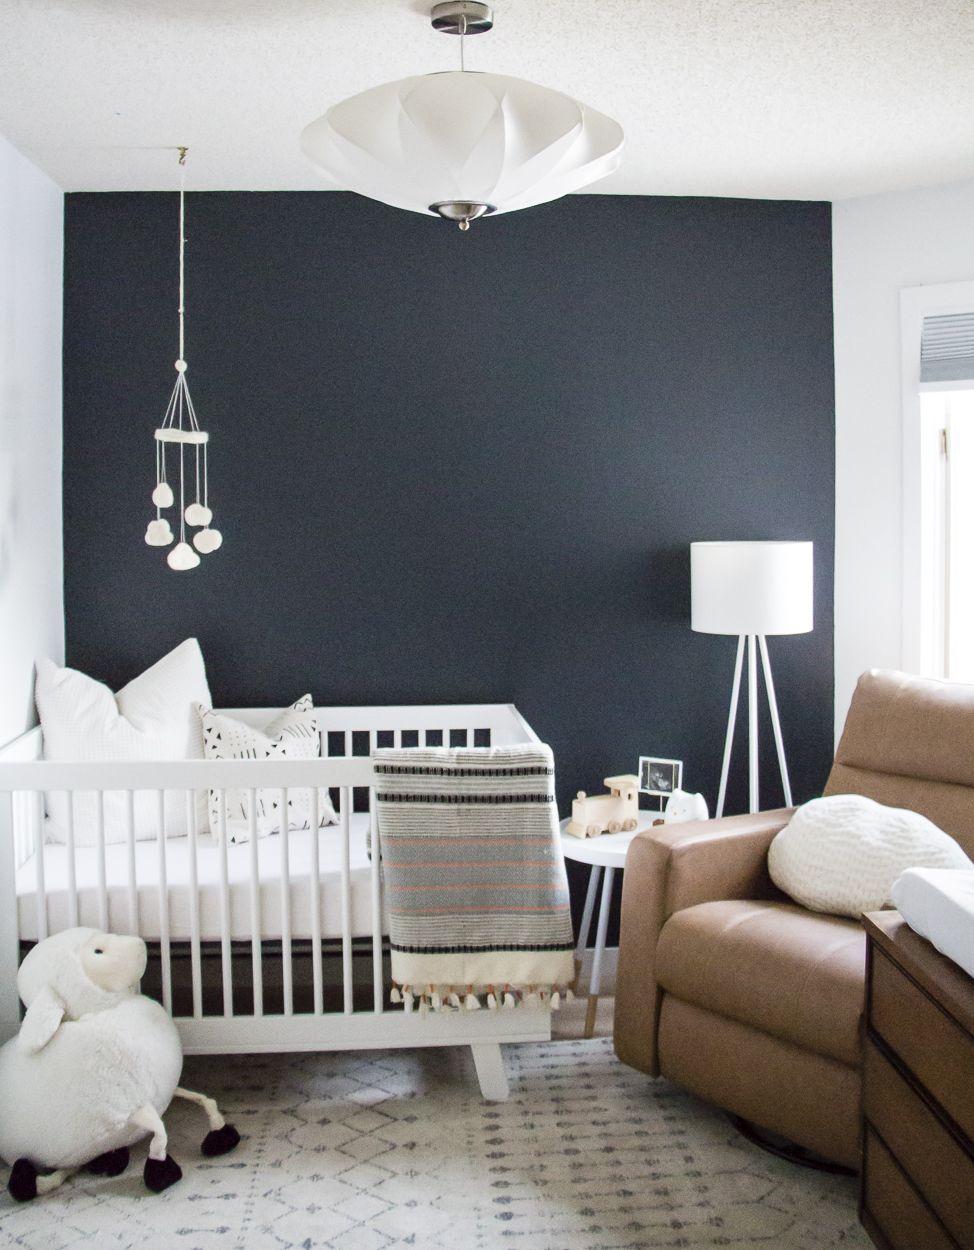 Baby Boy Room Themes Travel: Oh Baby! Jack's Sweet & Simple Nursery Reveal